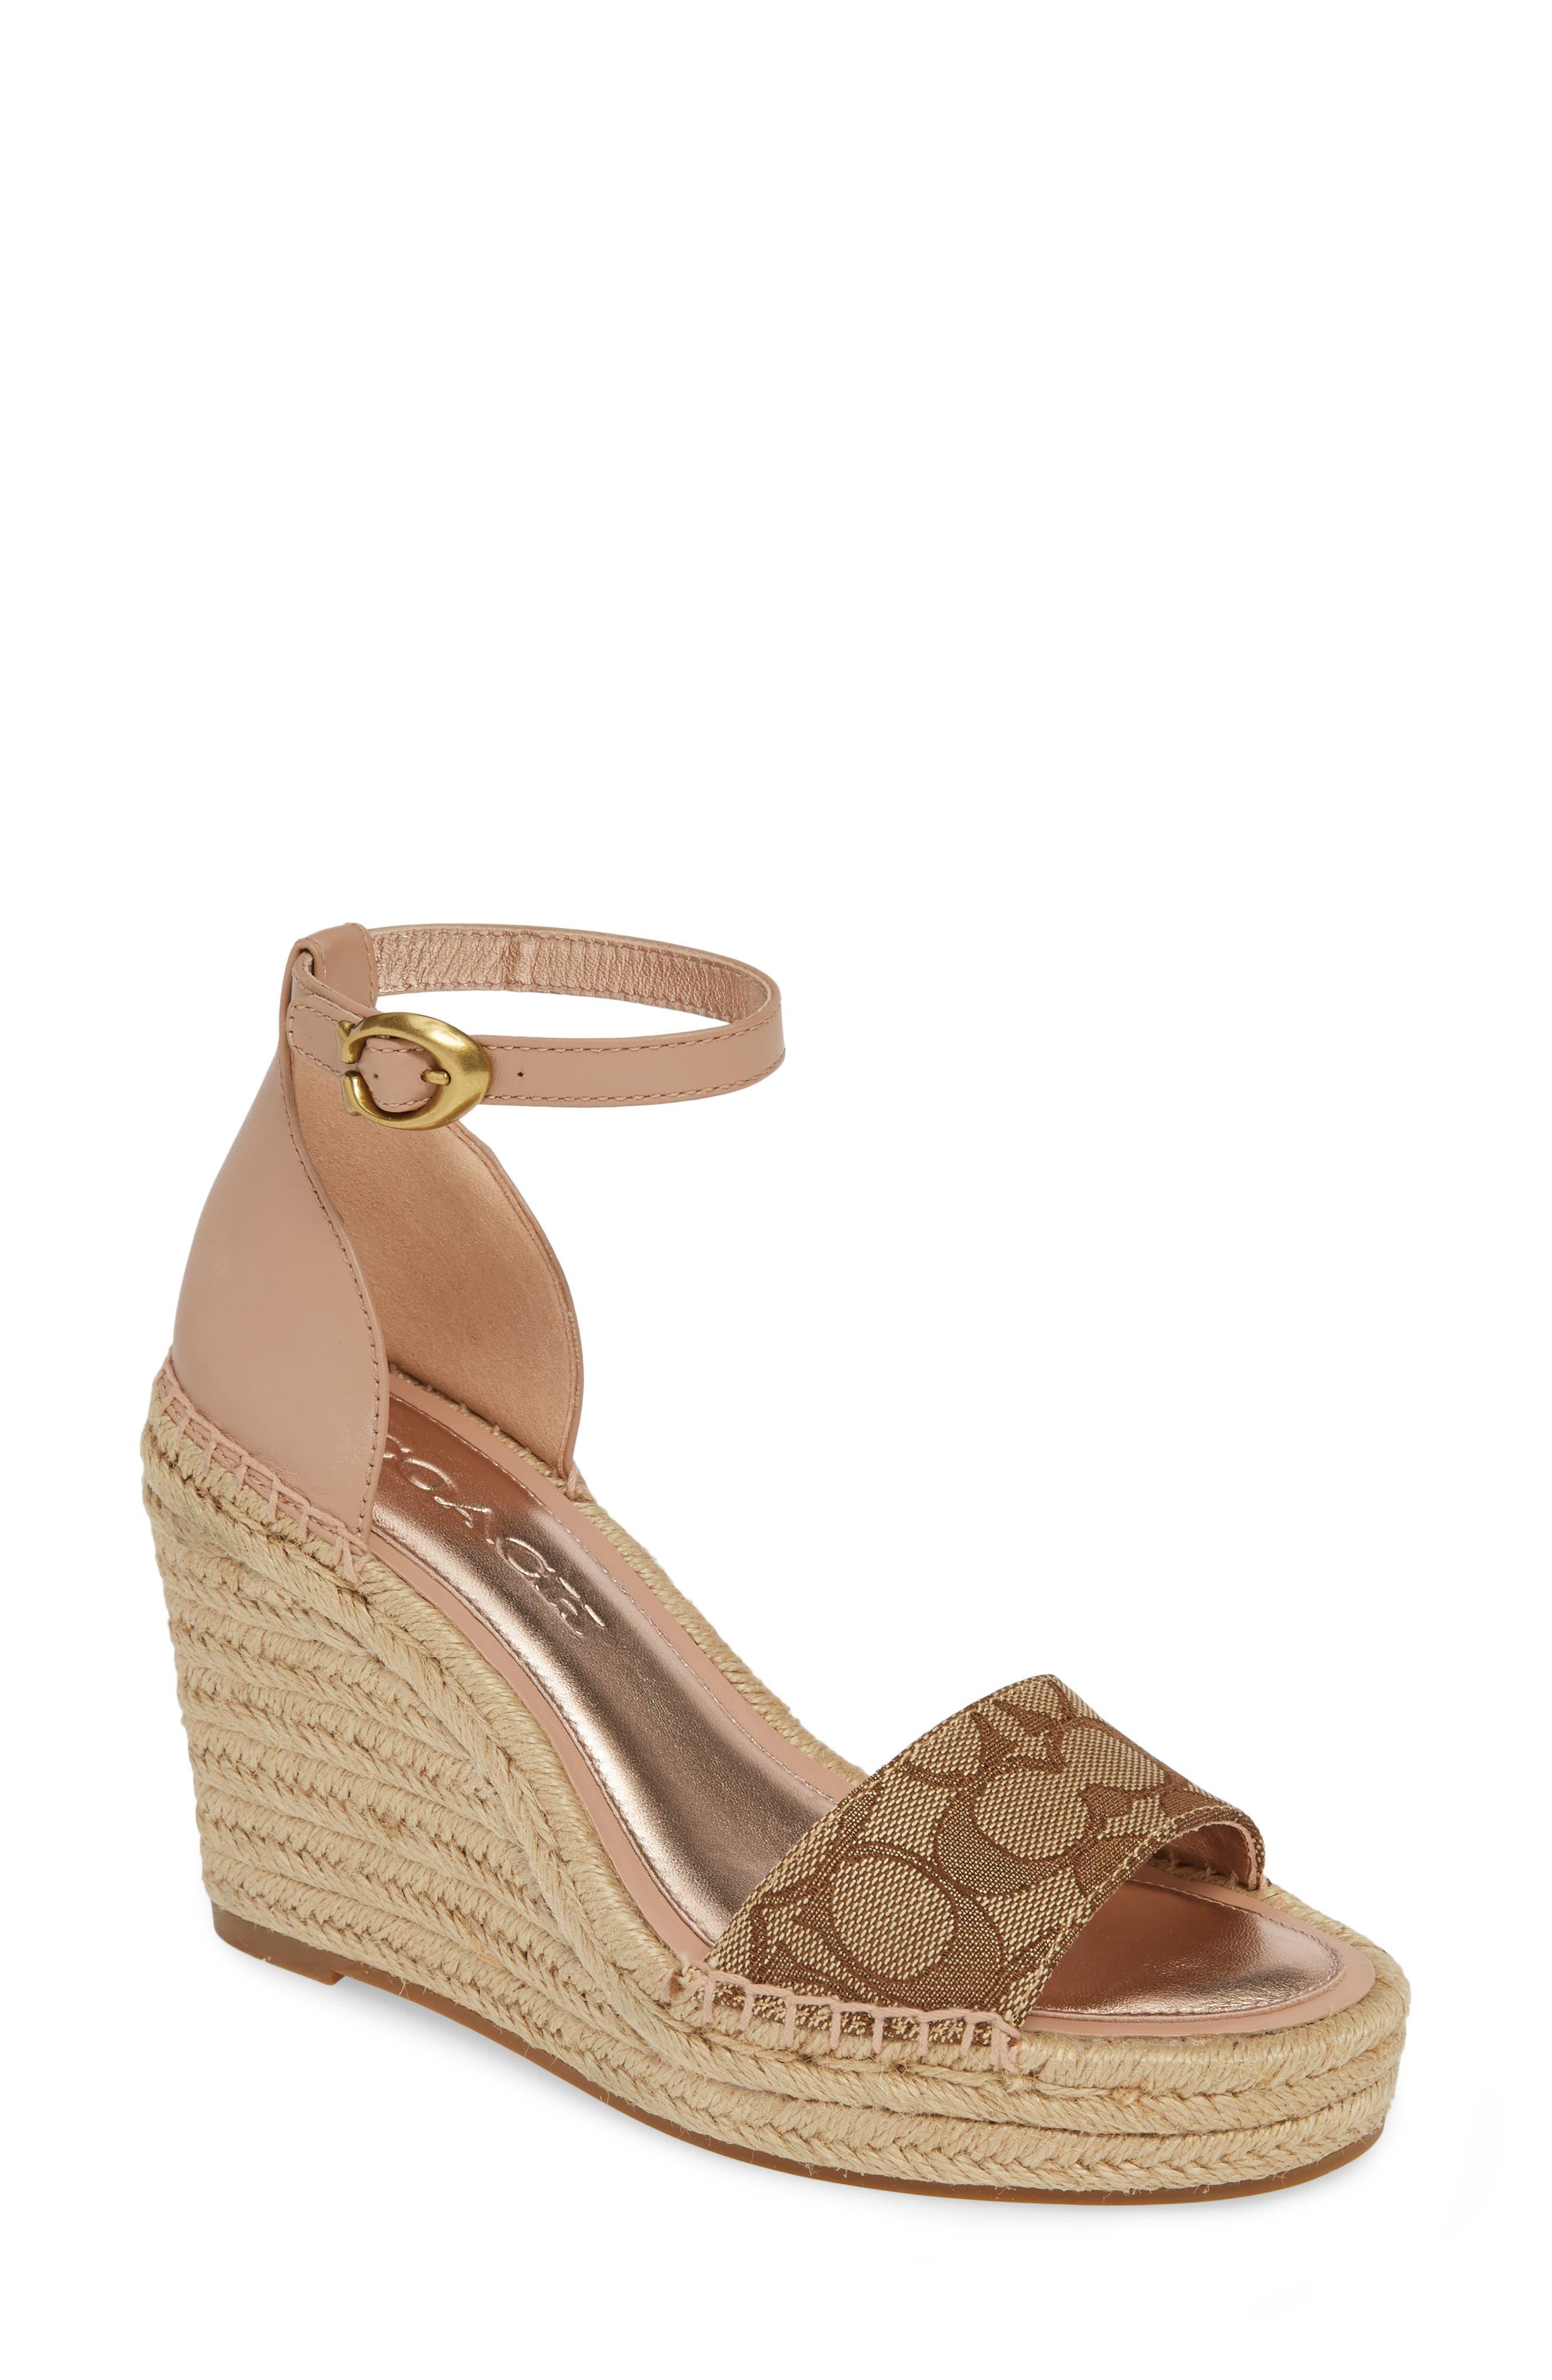 Coach Kit Espadrille Wedge Platform Sandal- Pink